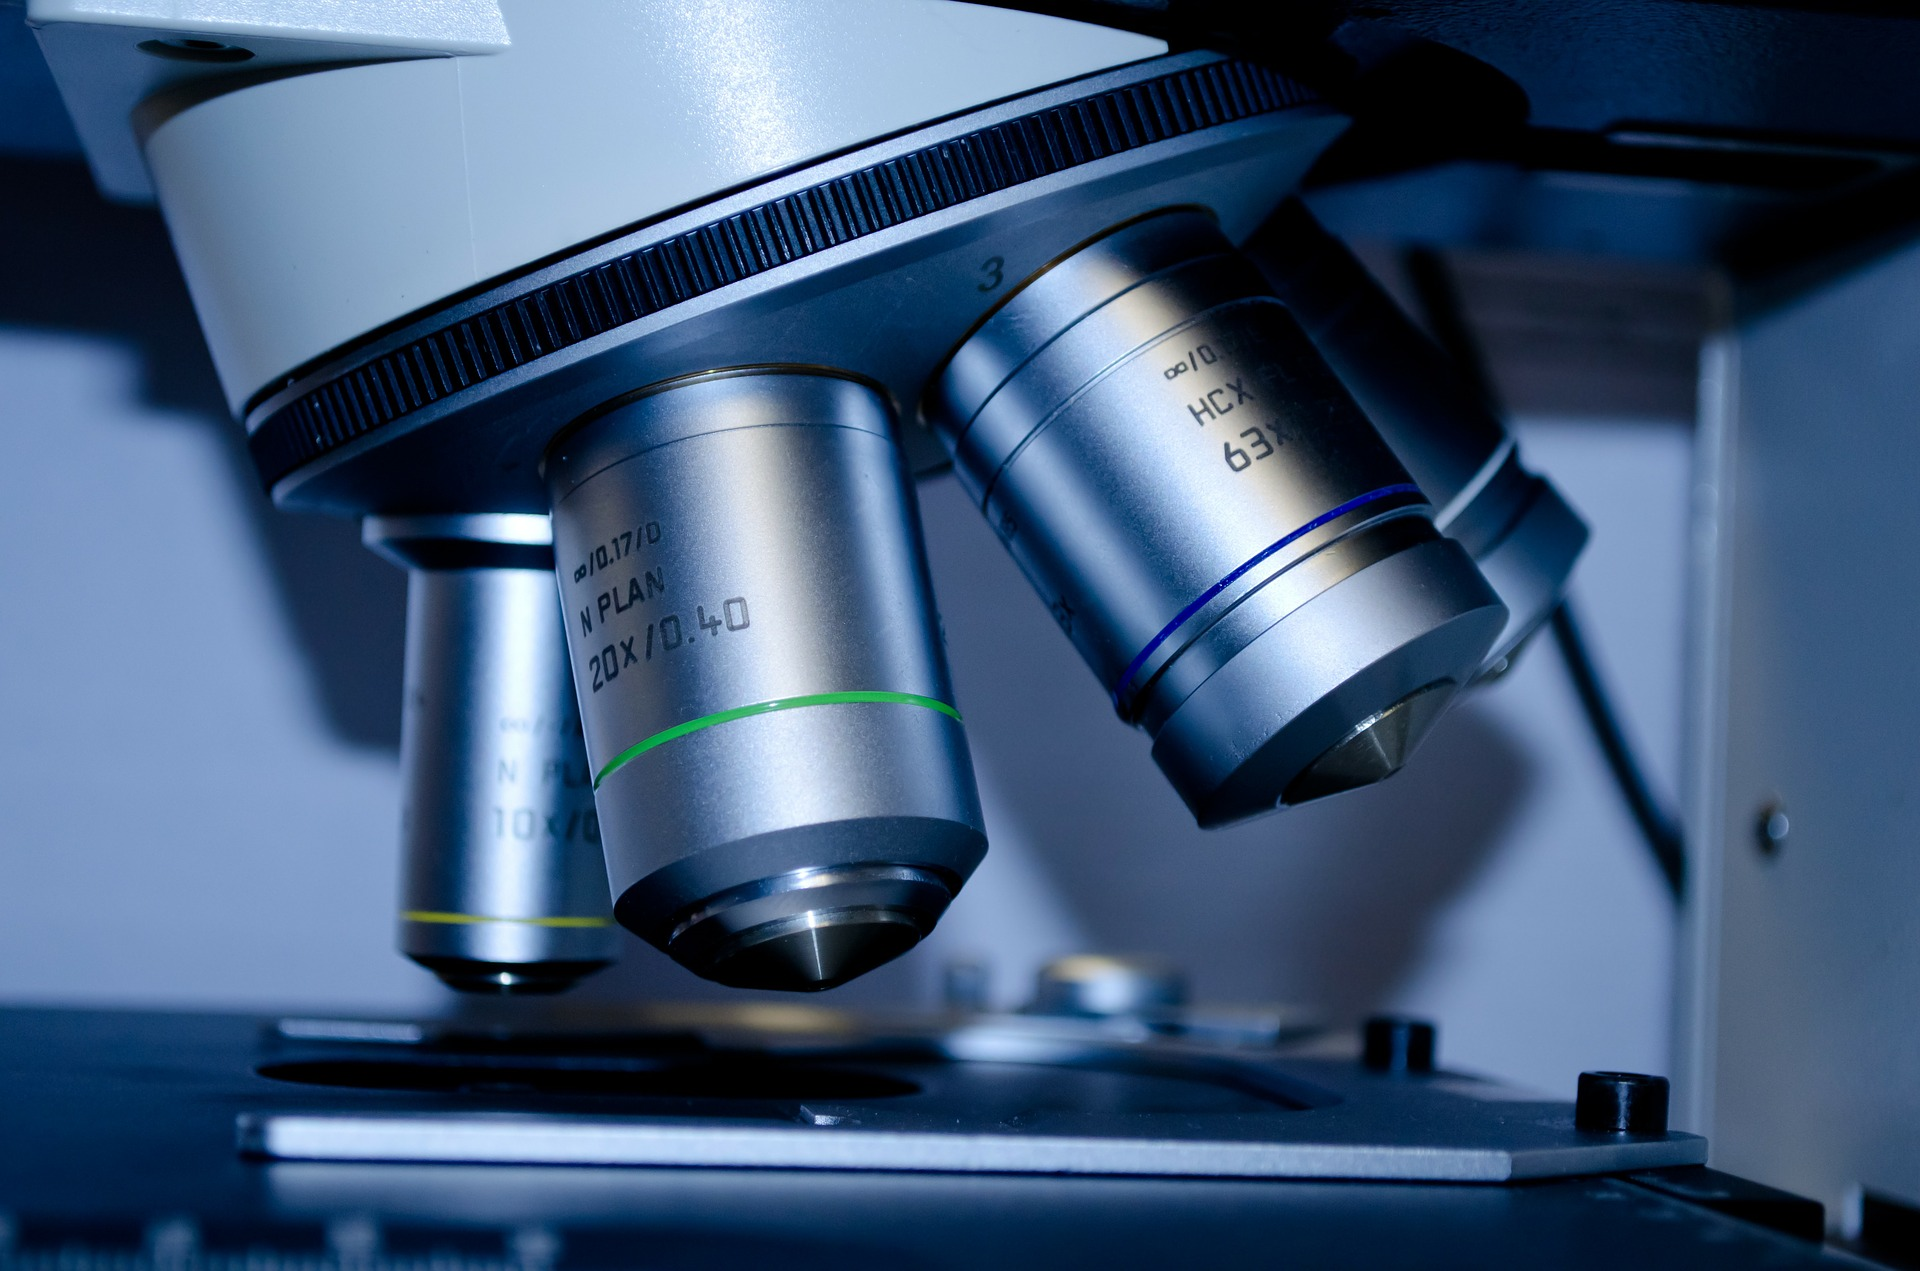 test_mikroskop_medizin